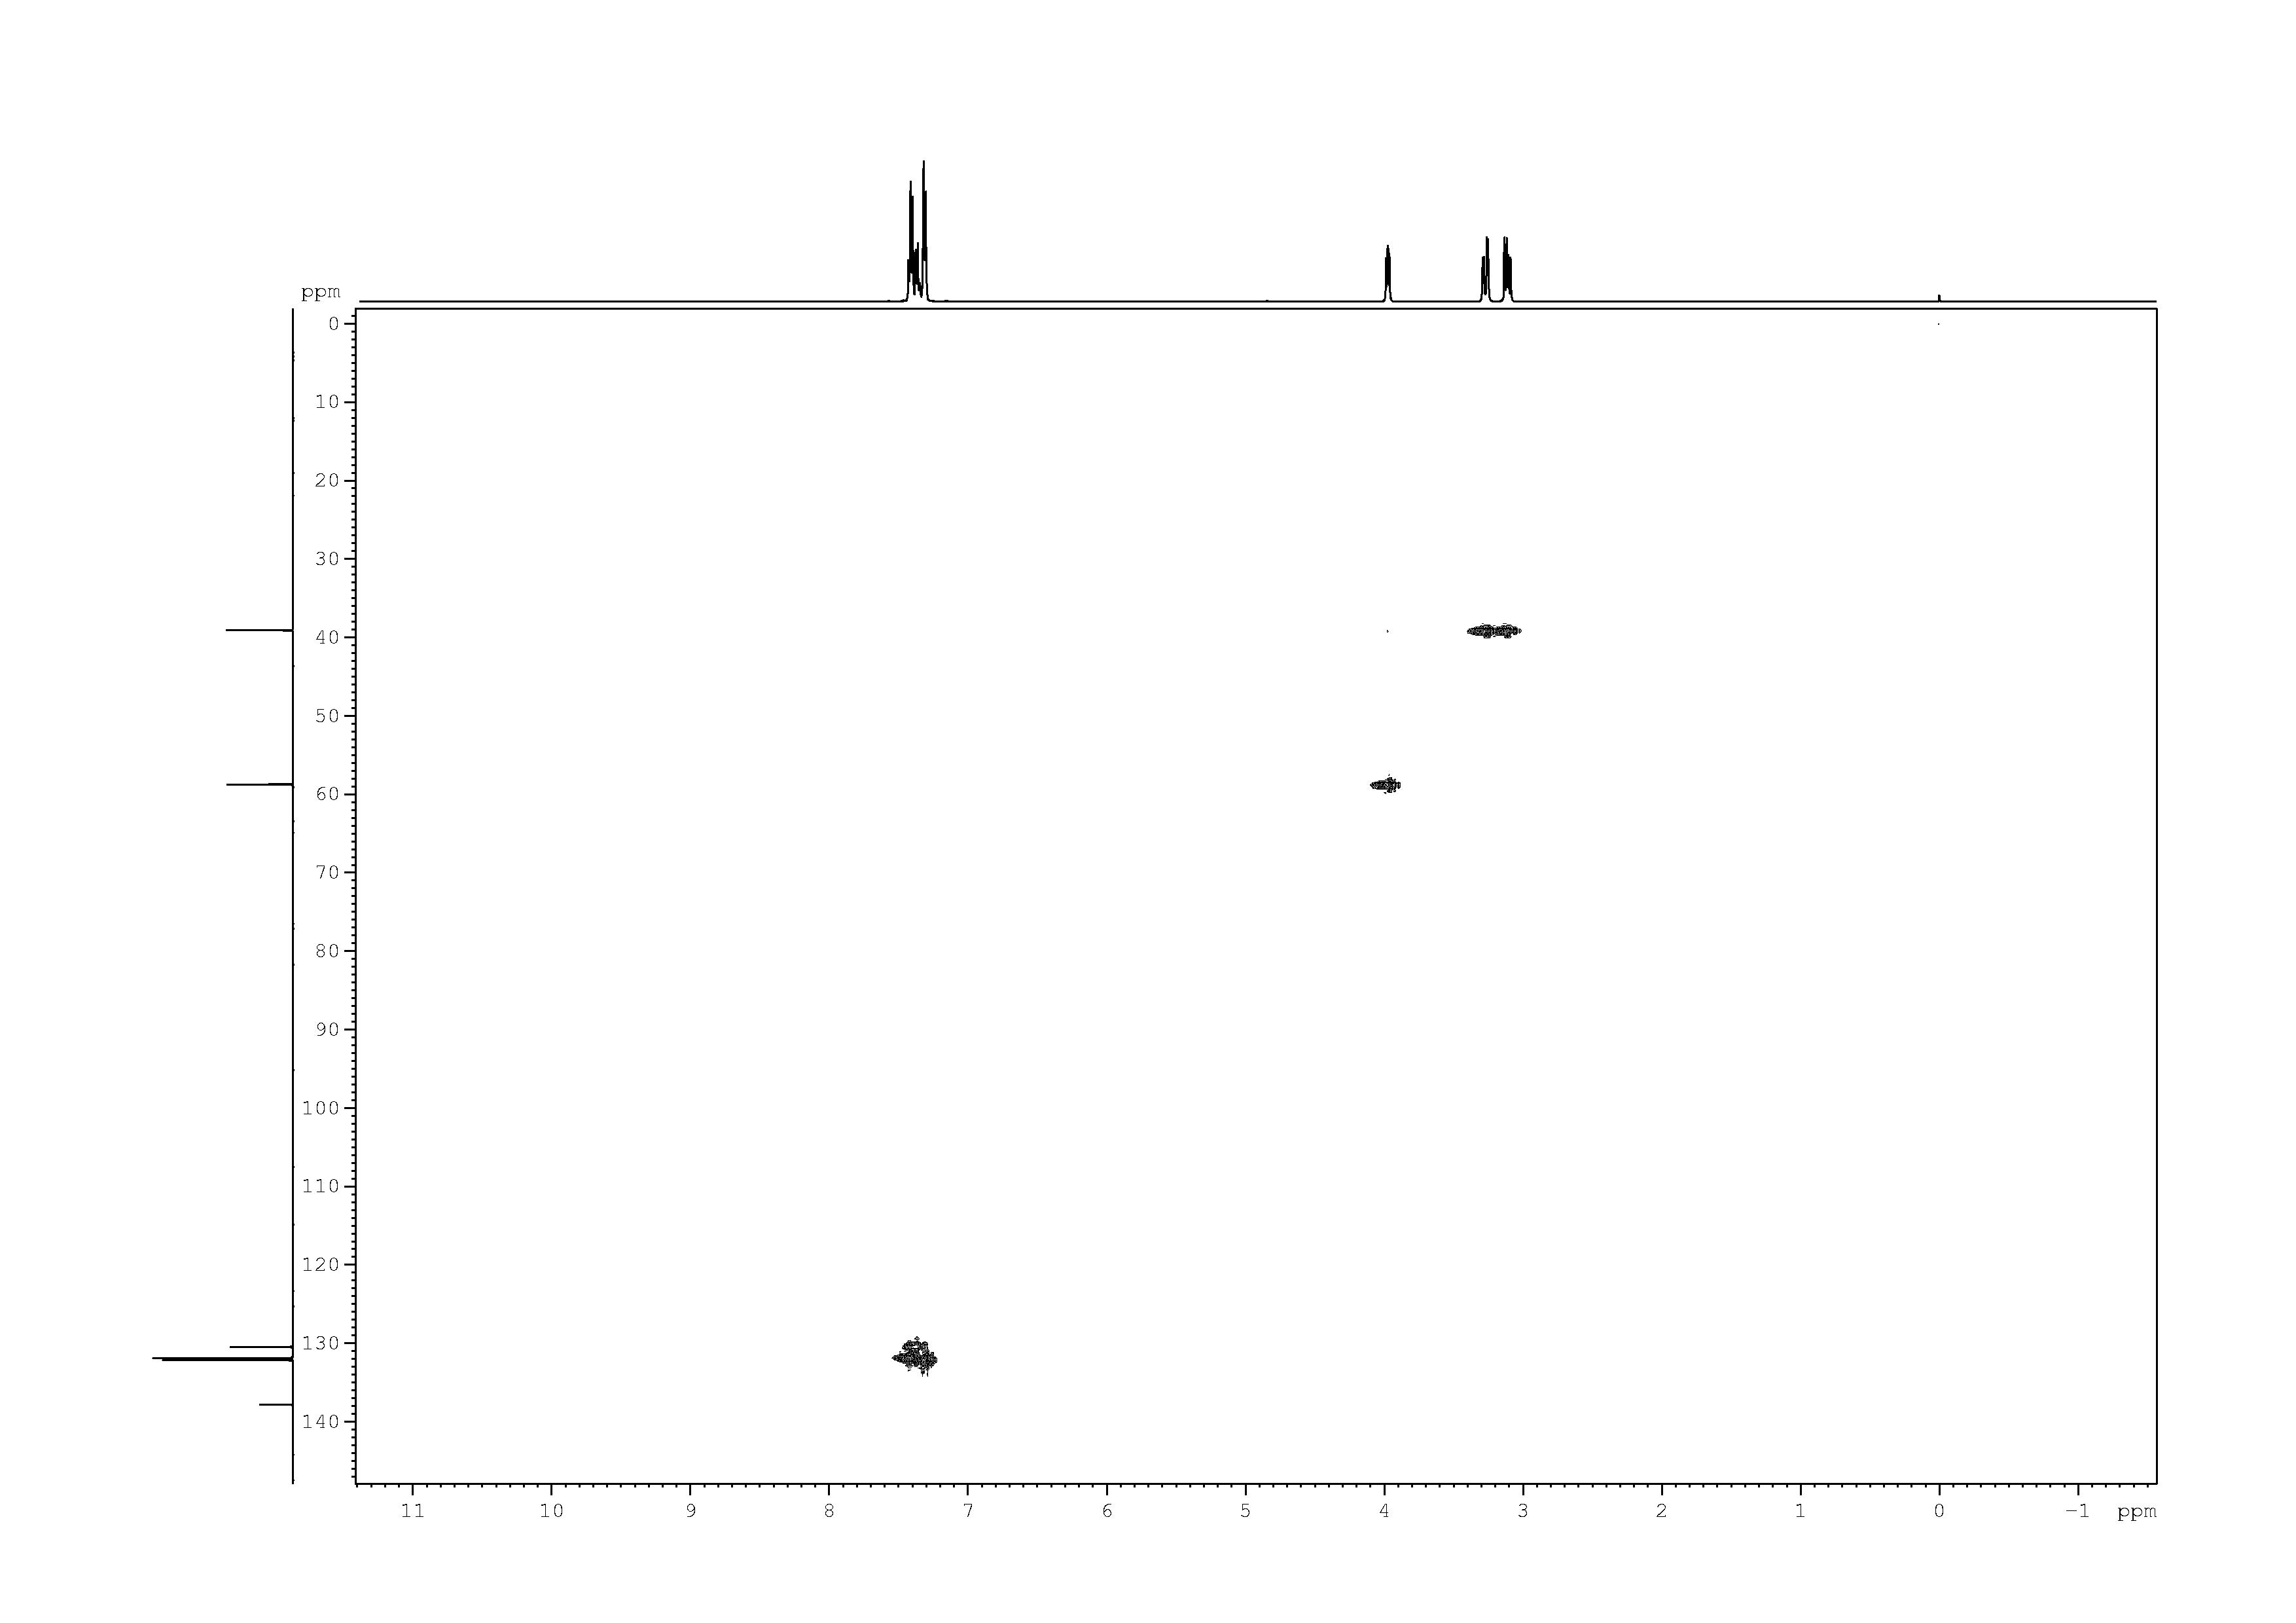 Bmse000045 L Phenylalanine At Bmrb Diagram Of An Oxygen Atom Photo Album Diagrams 2d 1h13c Hsqc 74 Spectrum For